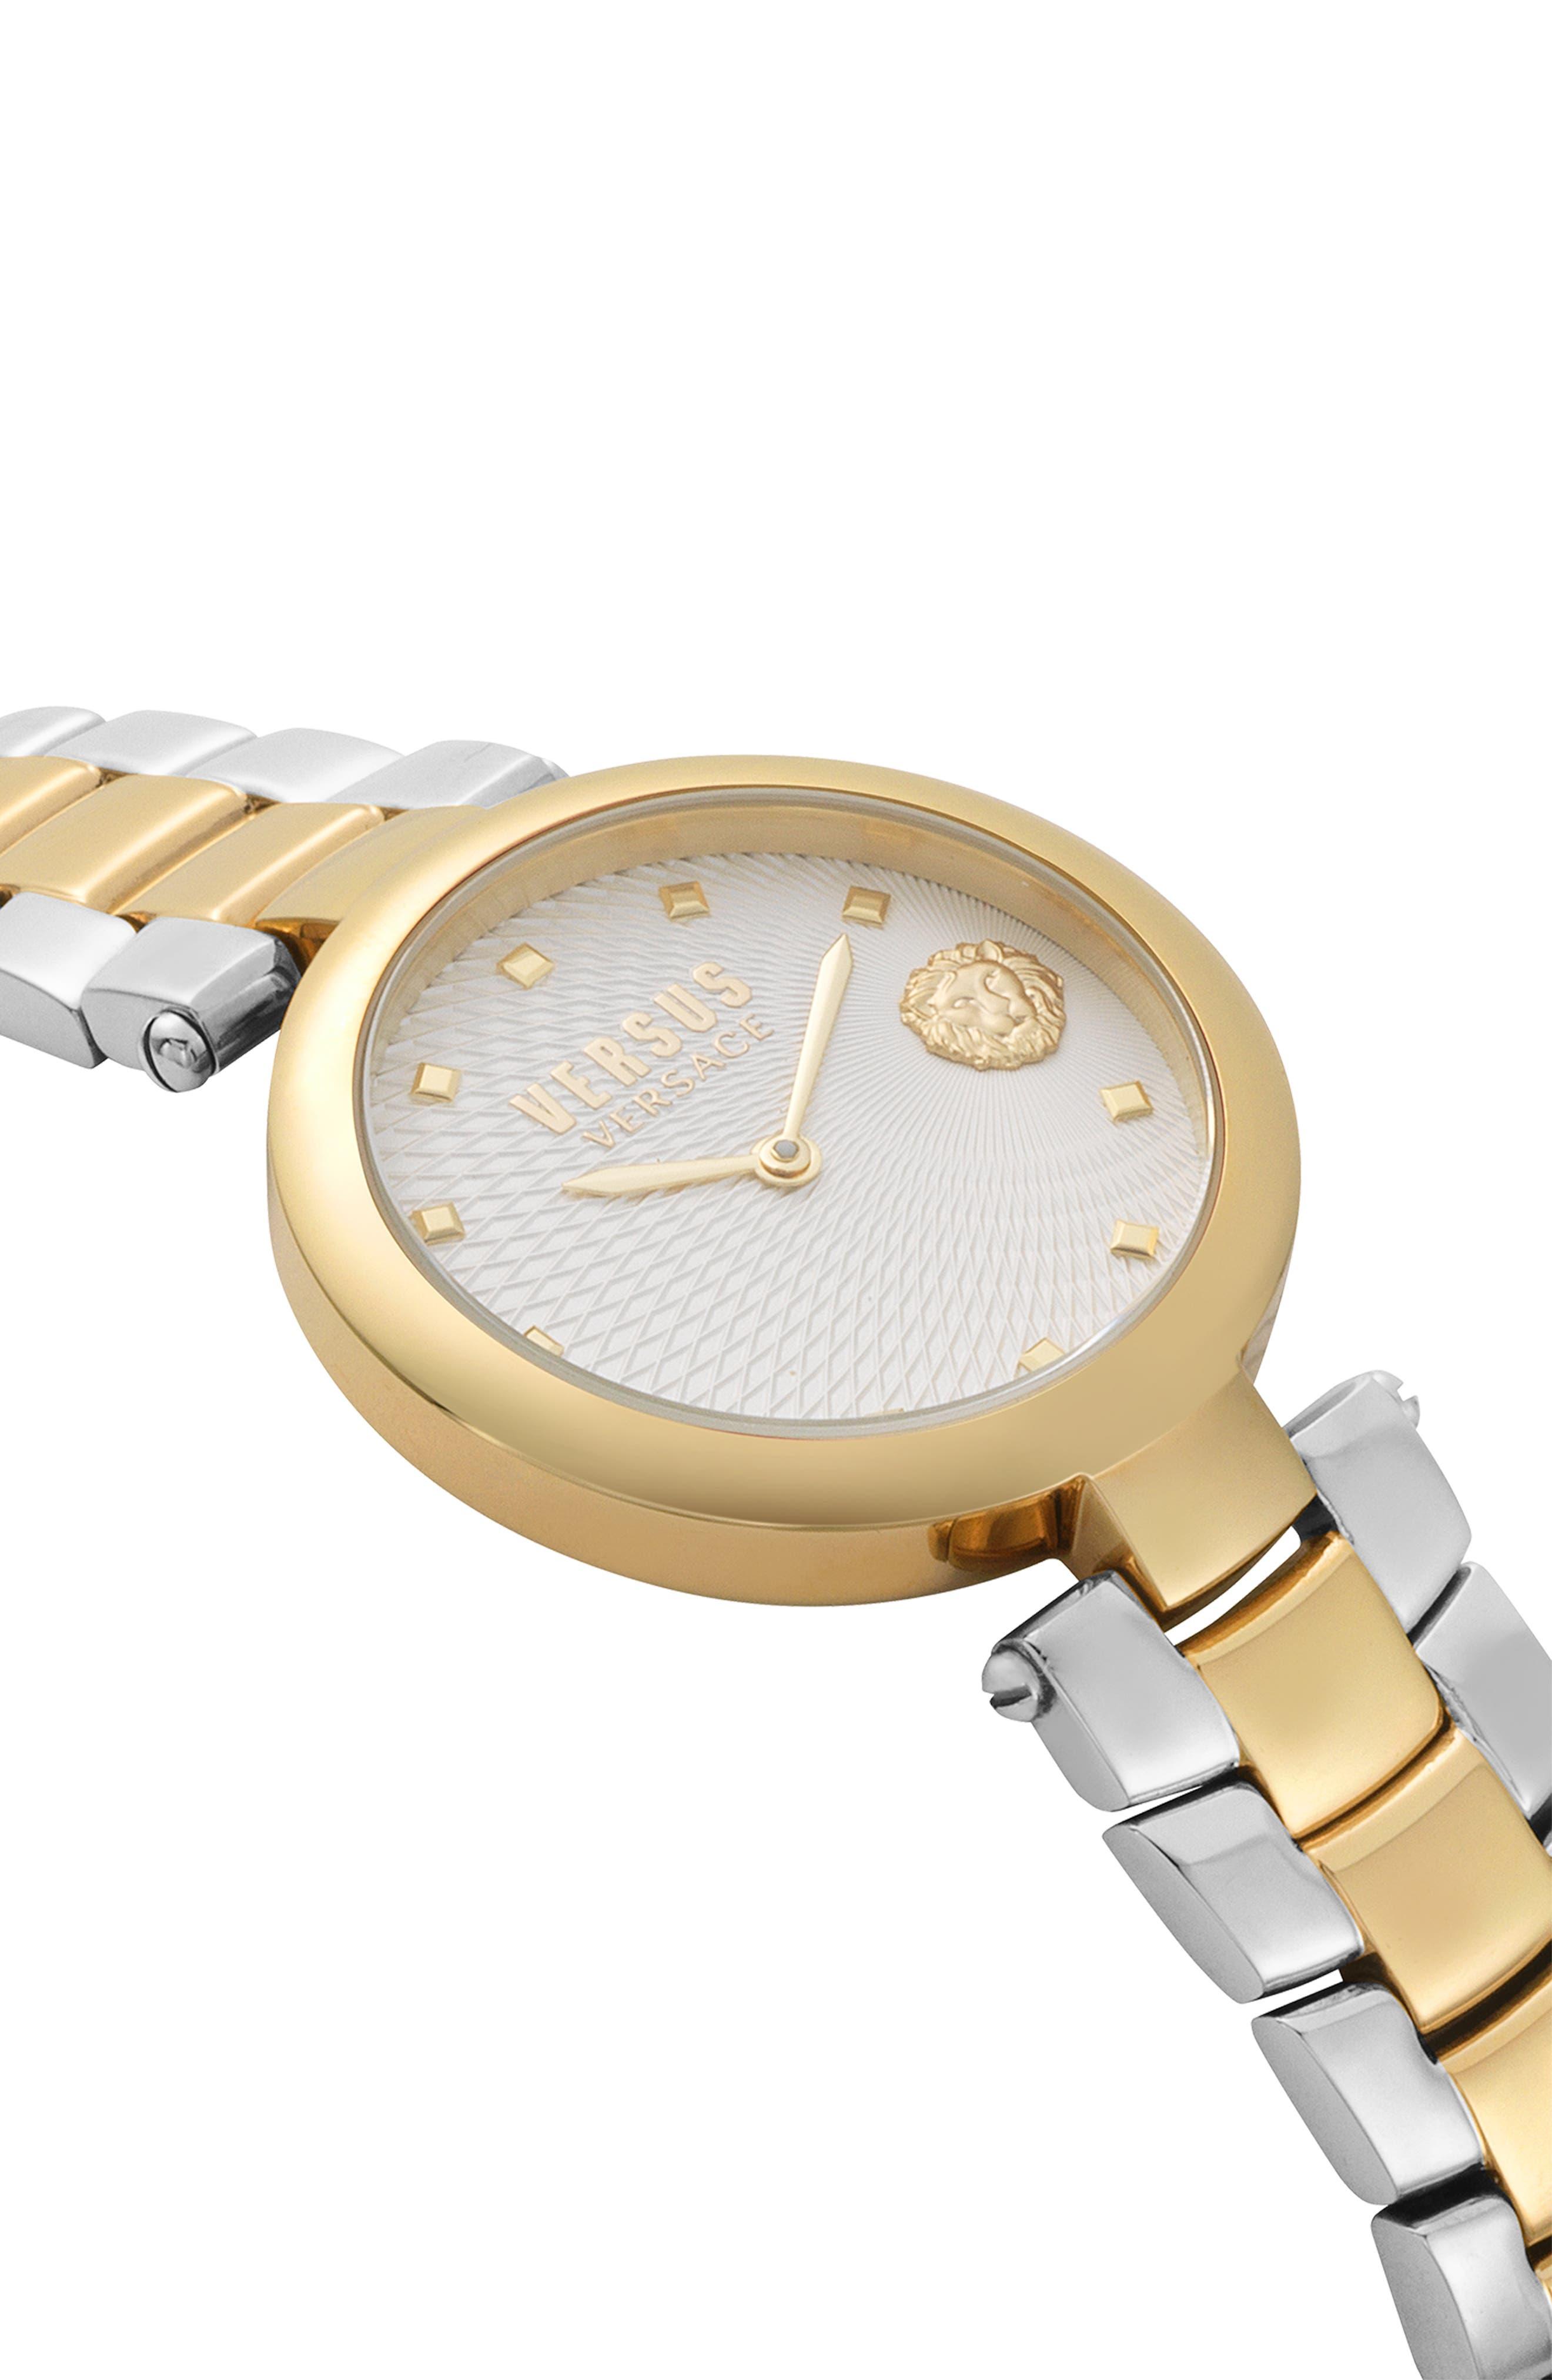 VERSUS VERSACE, Buffle Bay Bracelet Watch, 36mm, Alternate thumbnail 3, color, SILVER/ GOLD